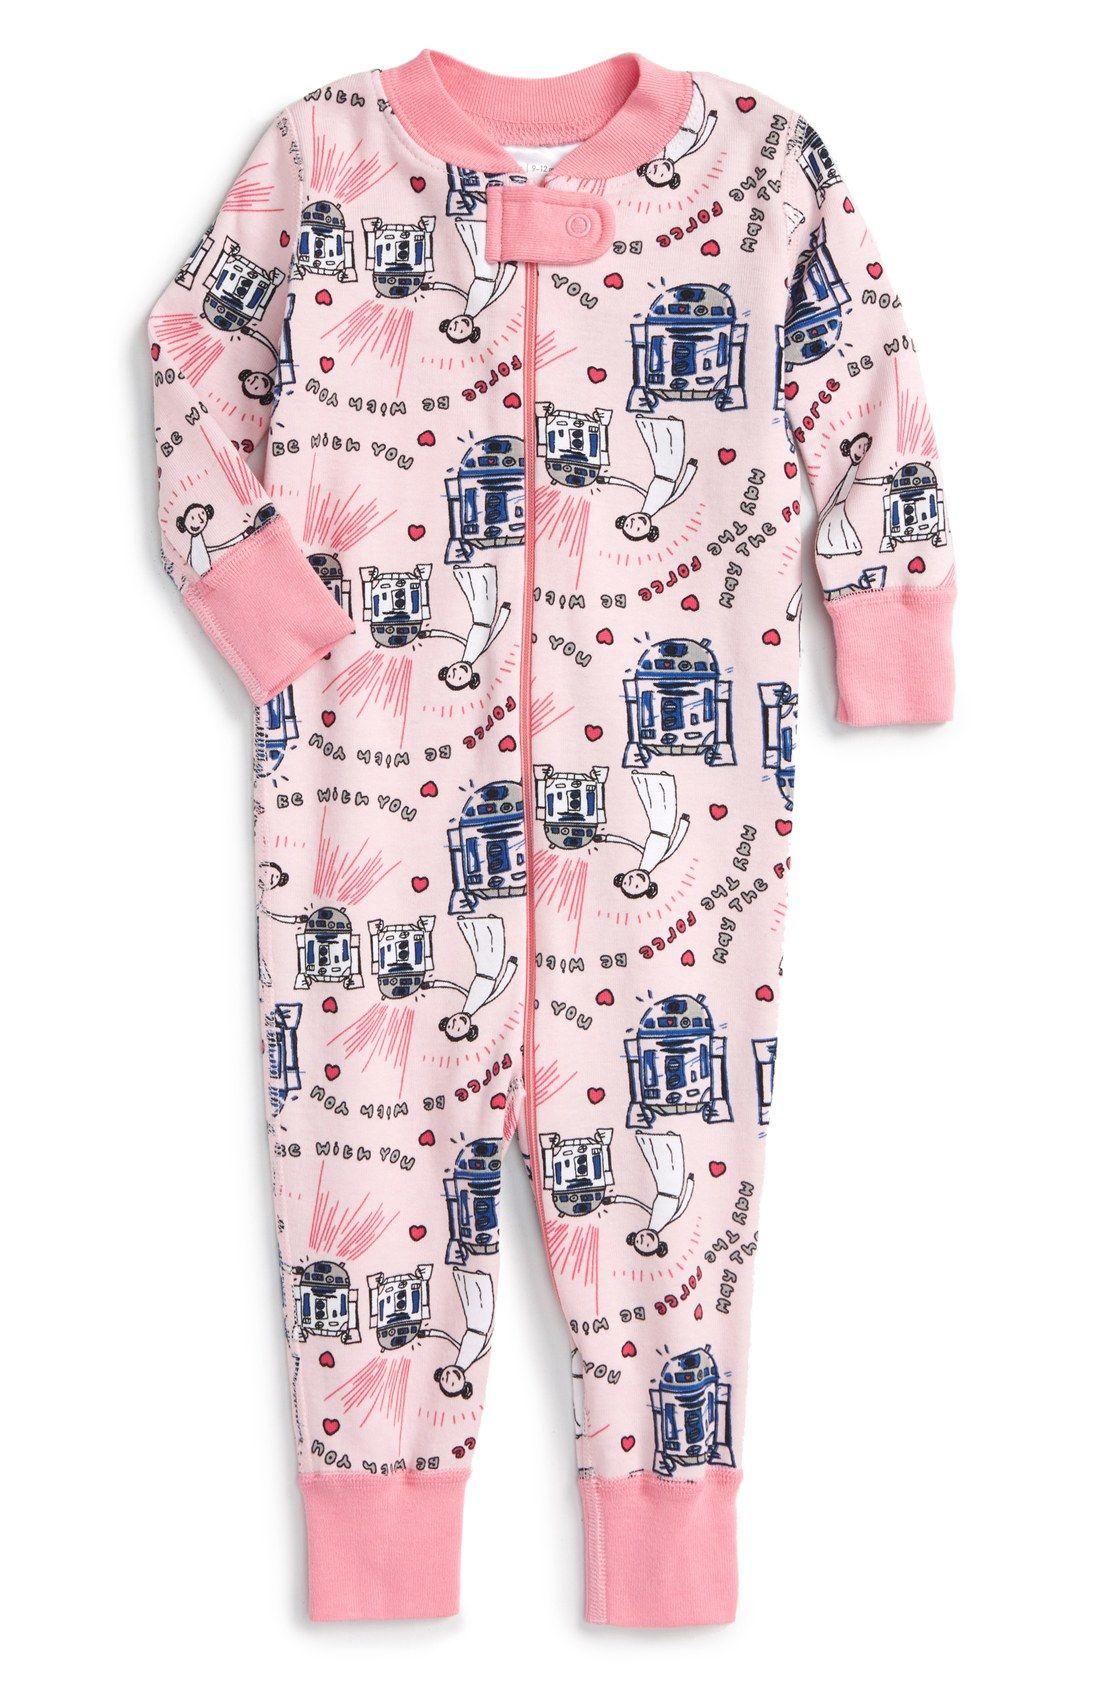 Hanna Andersson 'Star Wars - Valentine's Day' Organic Cotton ...